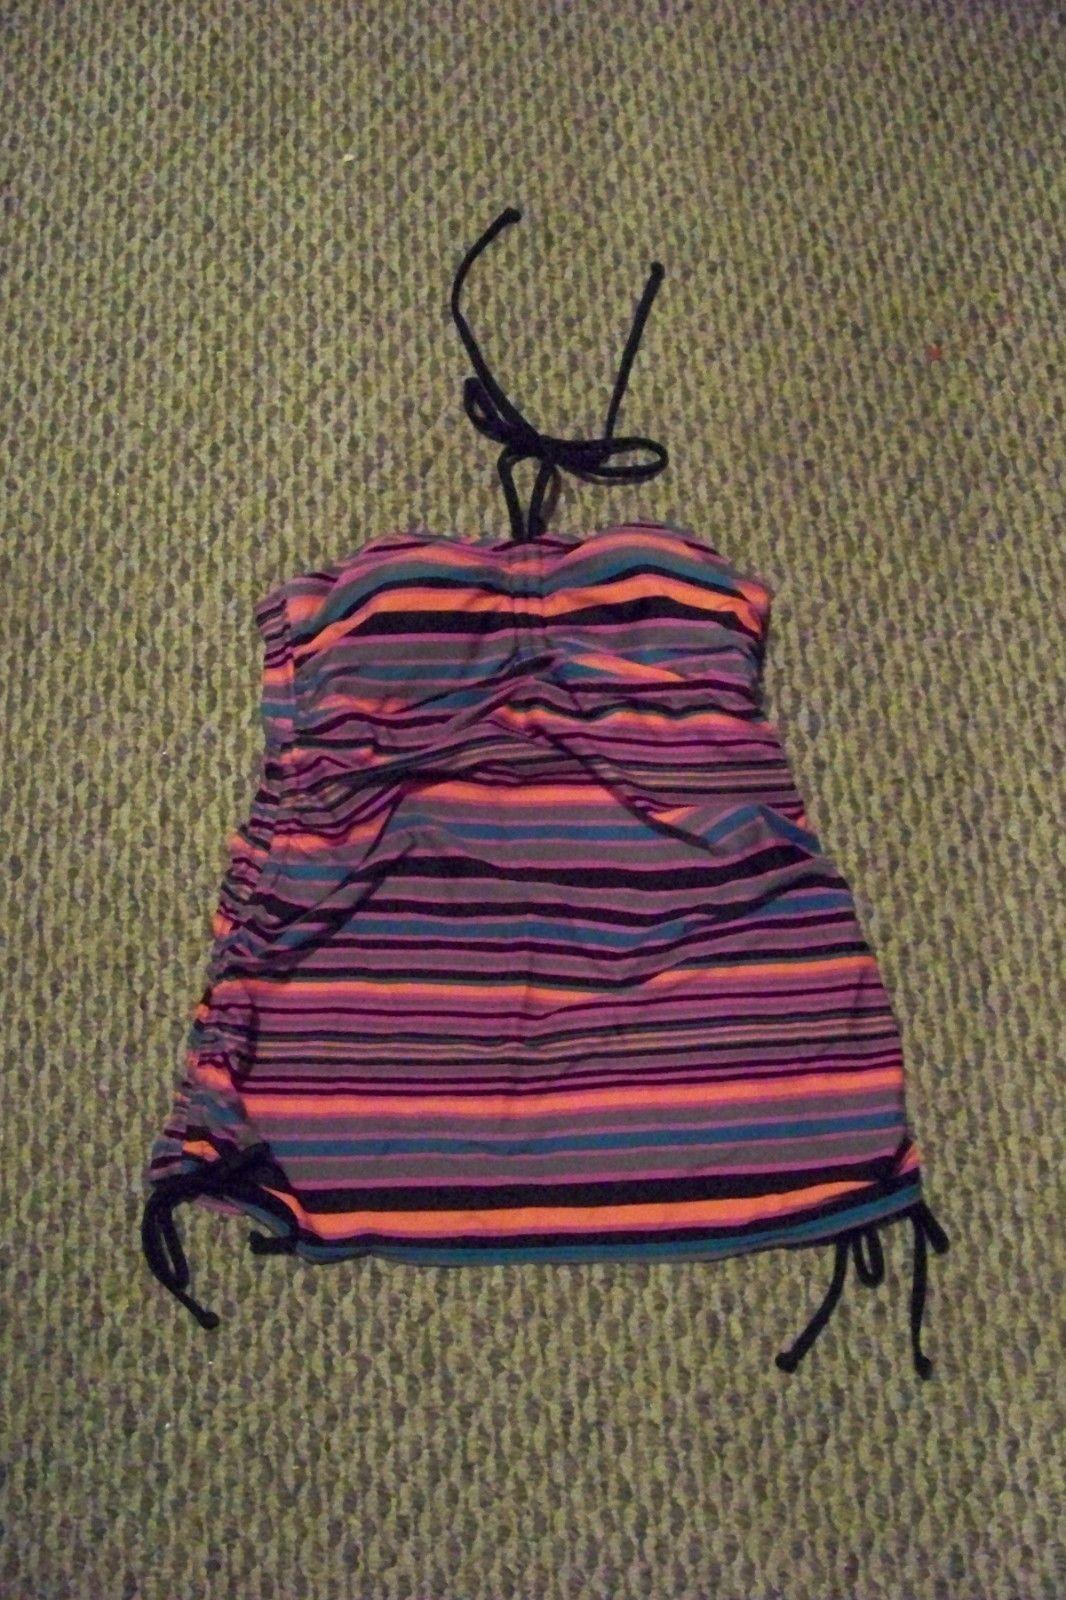 47e54b1f62 S l1600. S l1600. new womens liz lange maternity multi color striped tankini  swimsuit top size sm